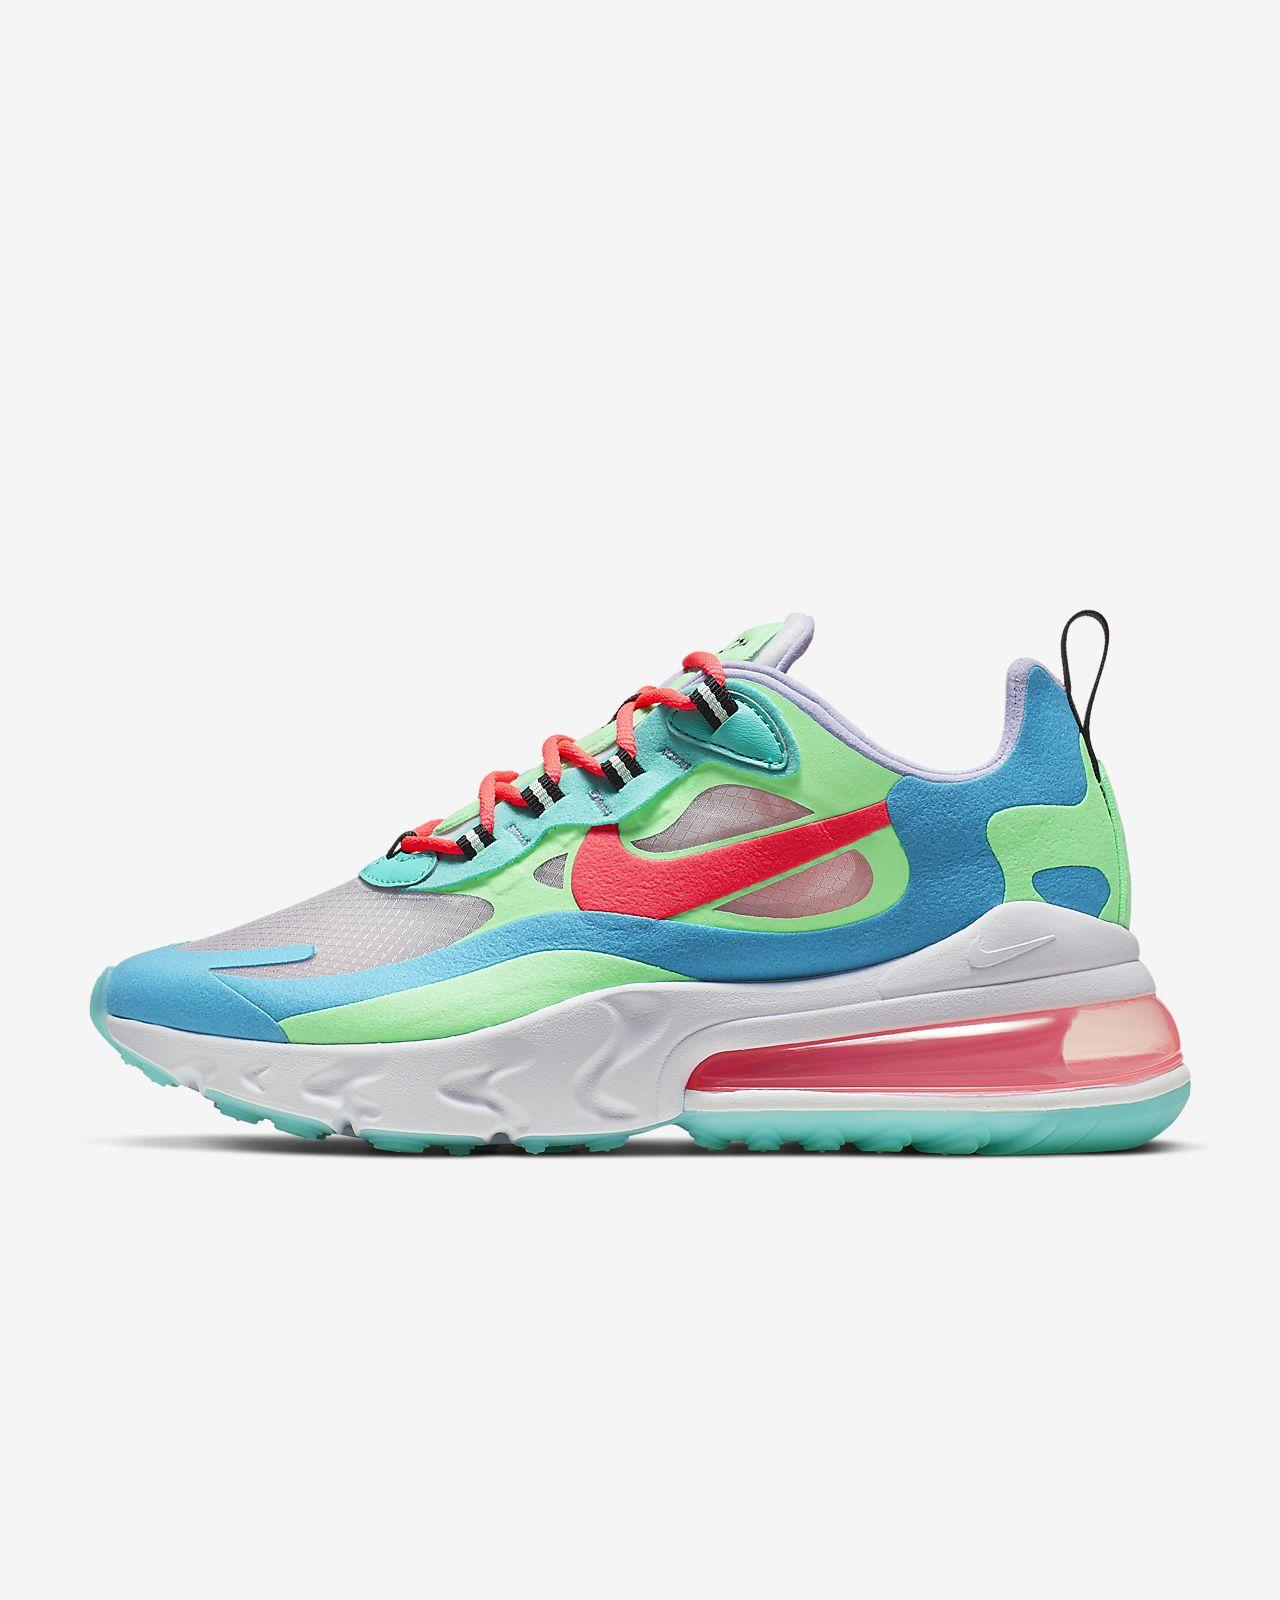 Nike Air Max 270 React女子运动鞋